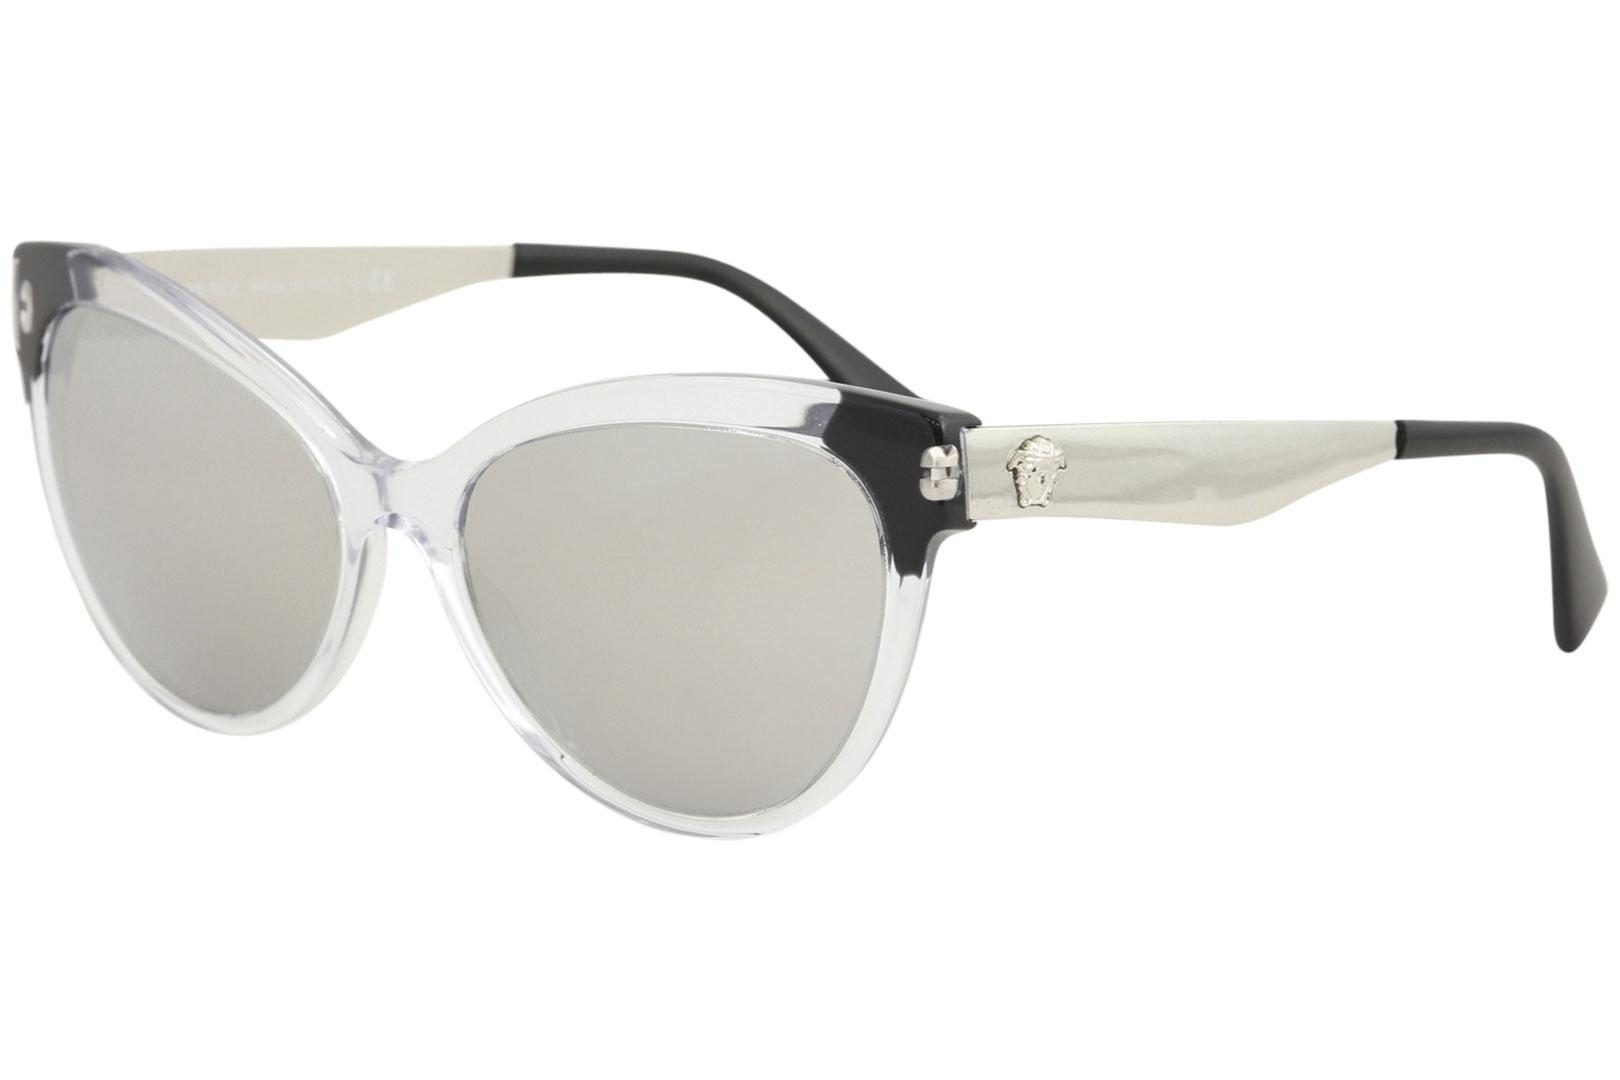 41d5a44b16fd Versace Women s VE4338 VE 4338 5243 6G Crystal Black Cat Eye ...